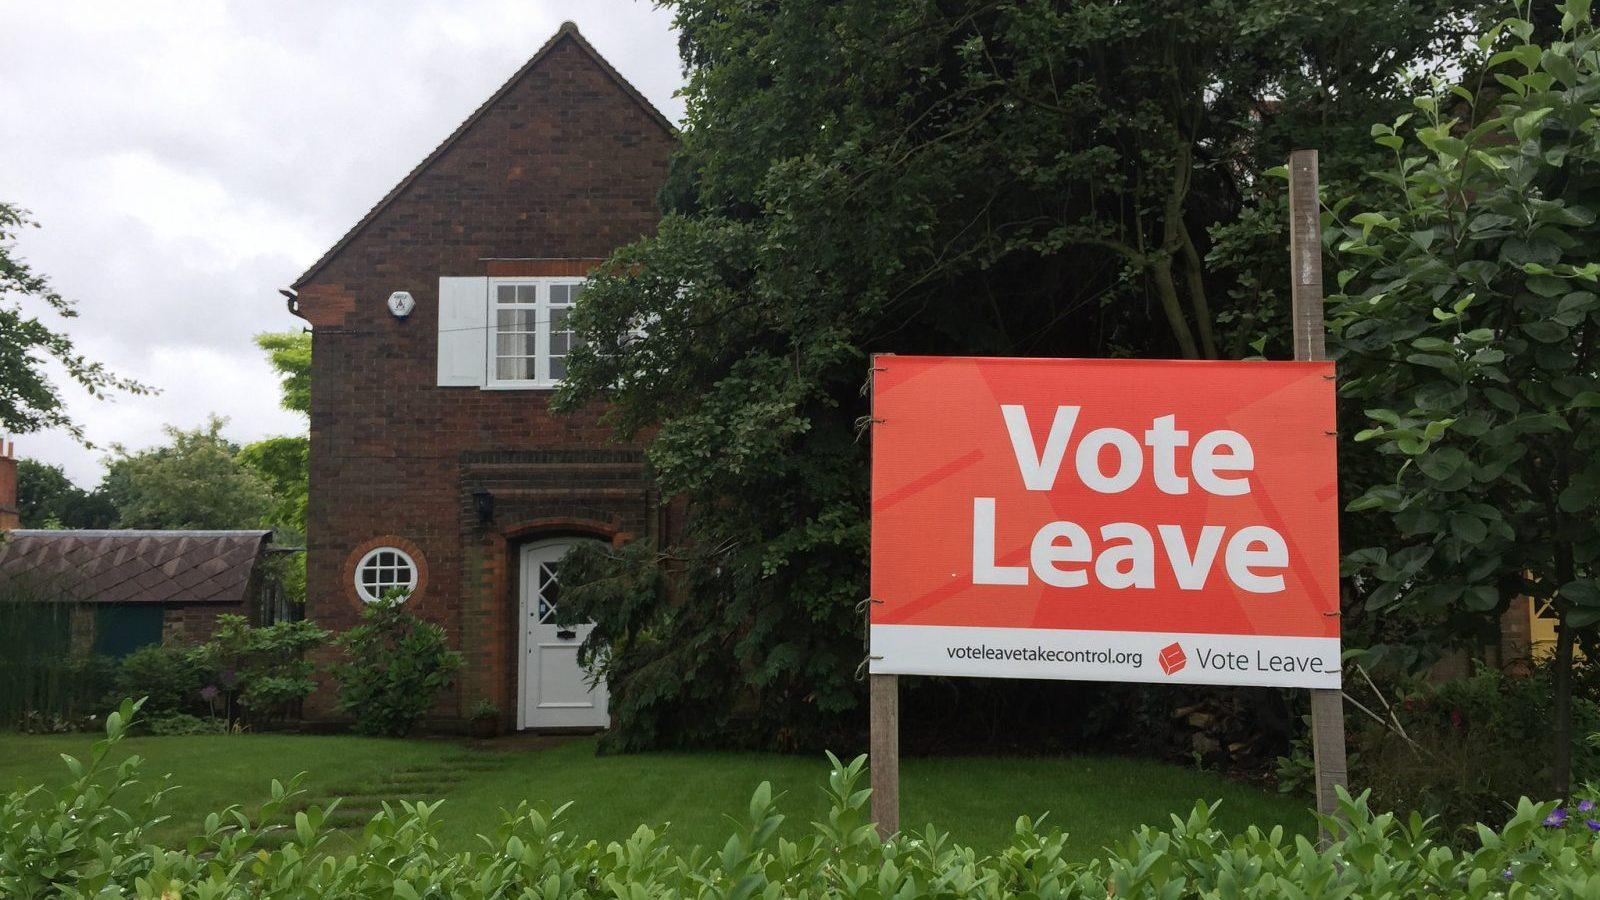 Vote leave poster, Euro referendum. Thames Ditton, Surrey